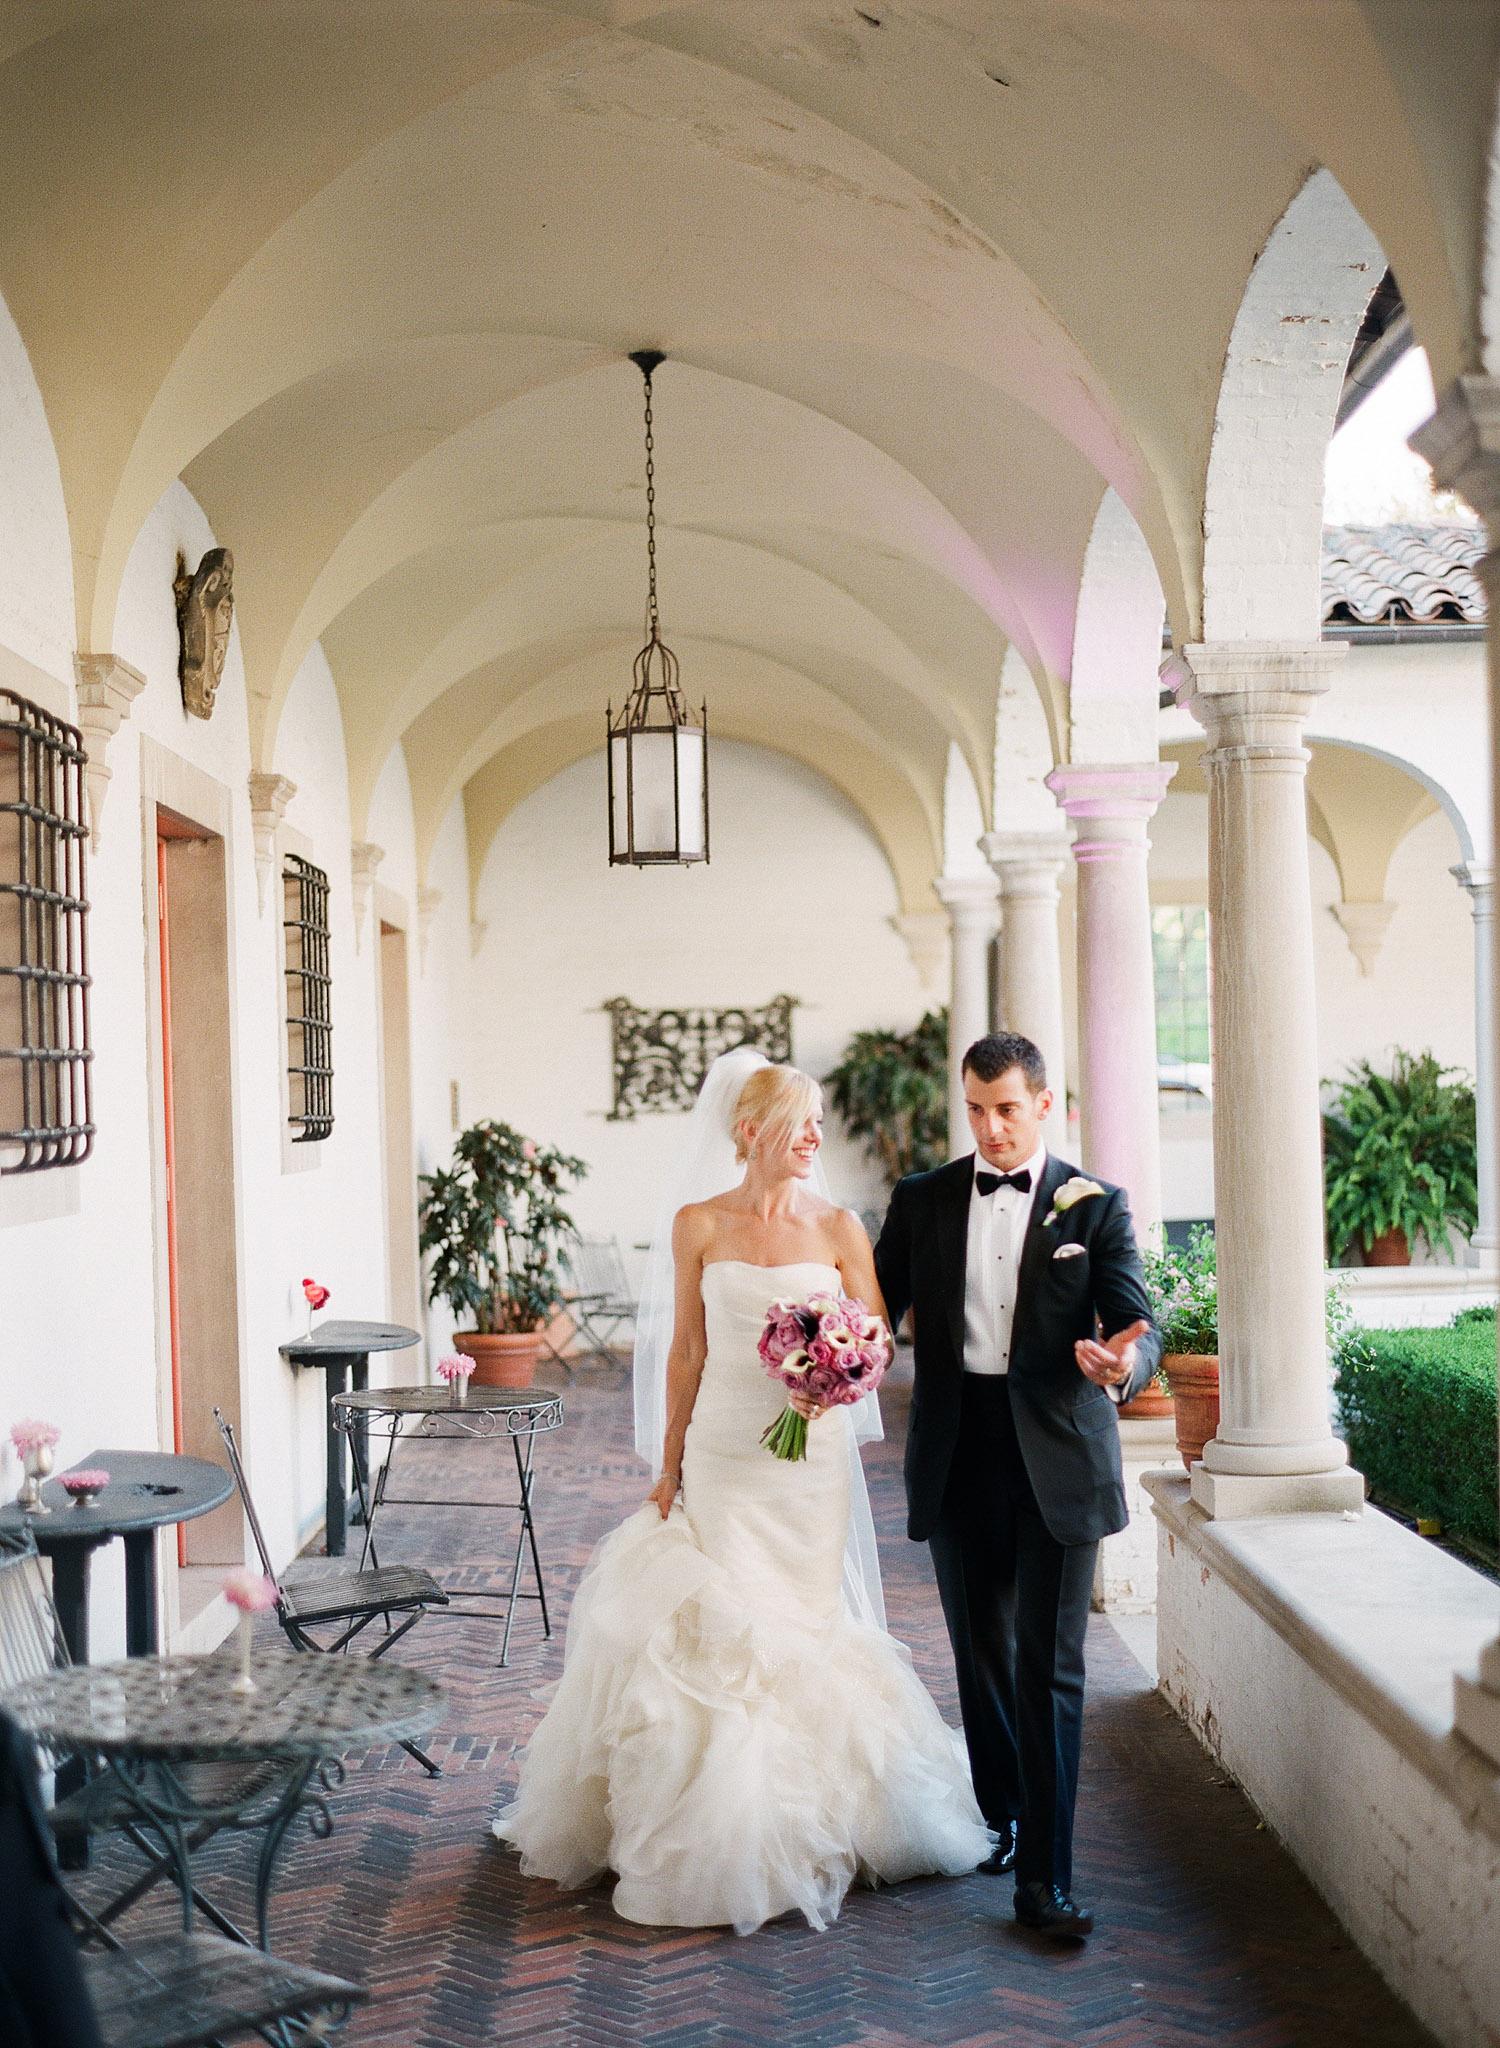 groom leads a bride through the columned corridors of the italian villa at their destination italian wedding while Destination wedding photographer lexia frank photographs their wedding on film at the Villa Terrace